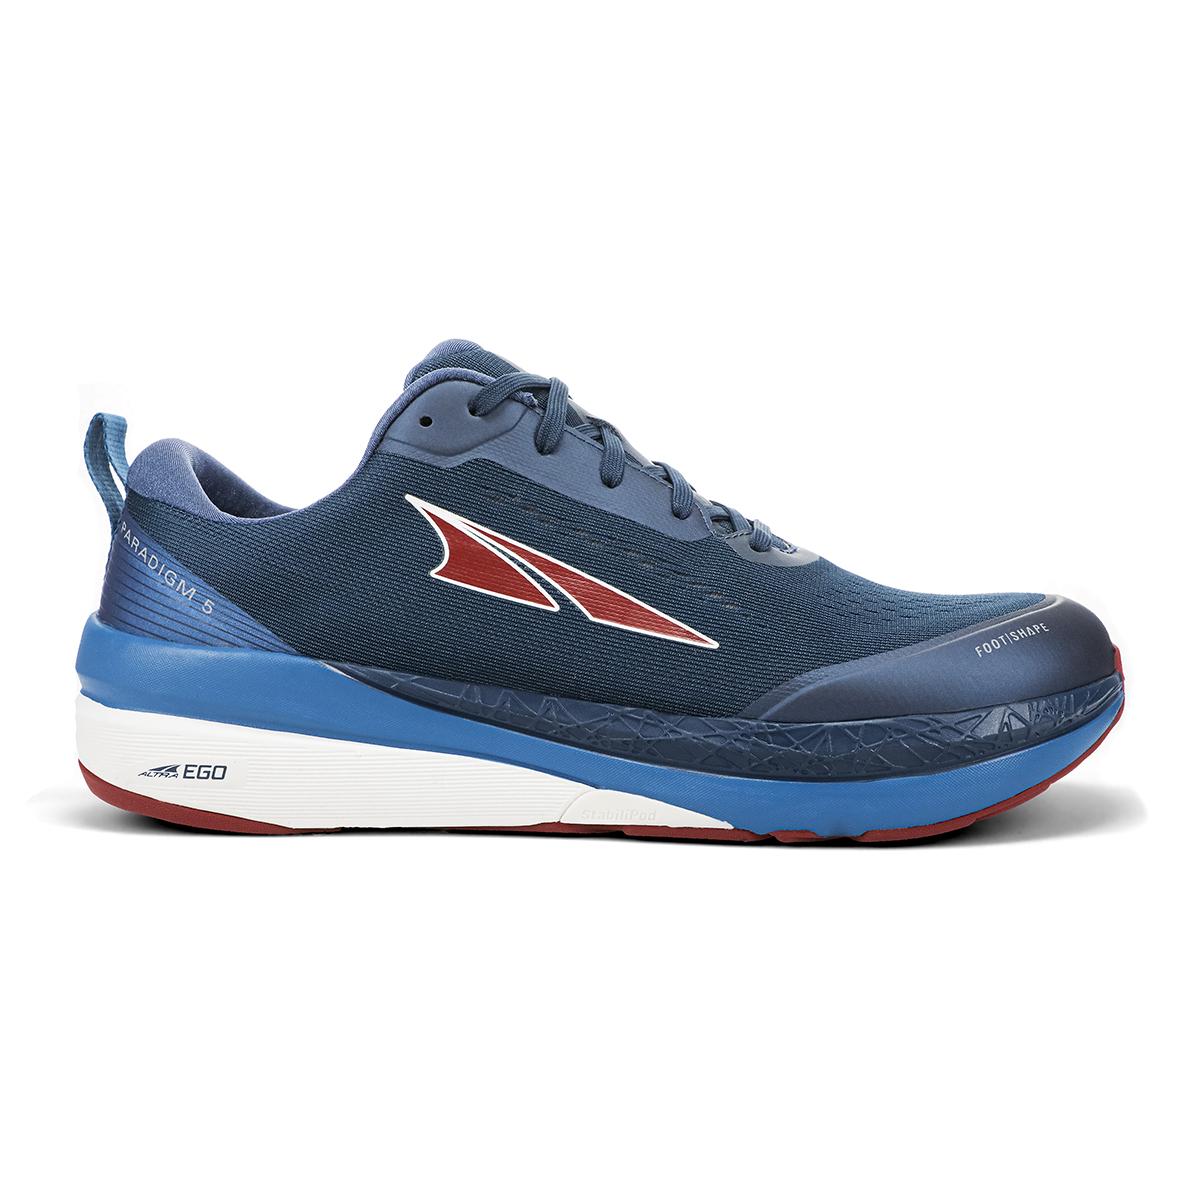 Altra Paradigm 5 Running Shoe $94.98 + Free S/H at JackRabbit